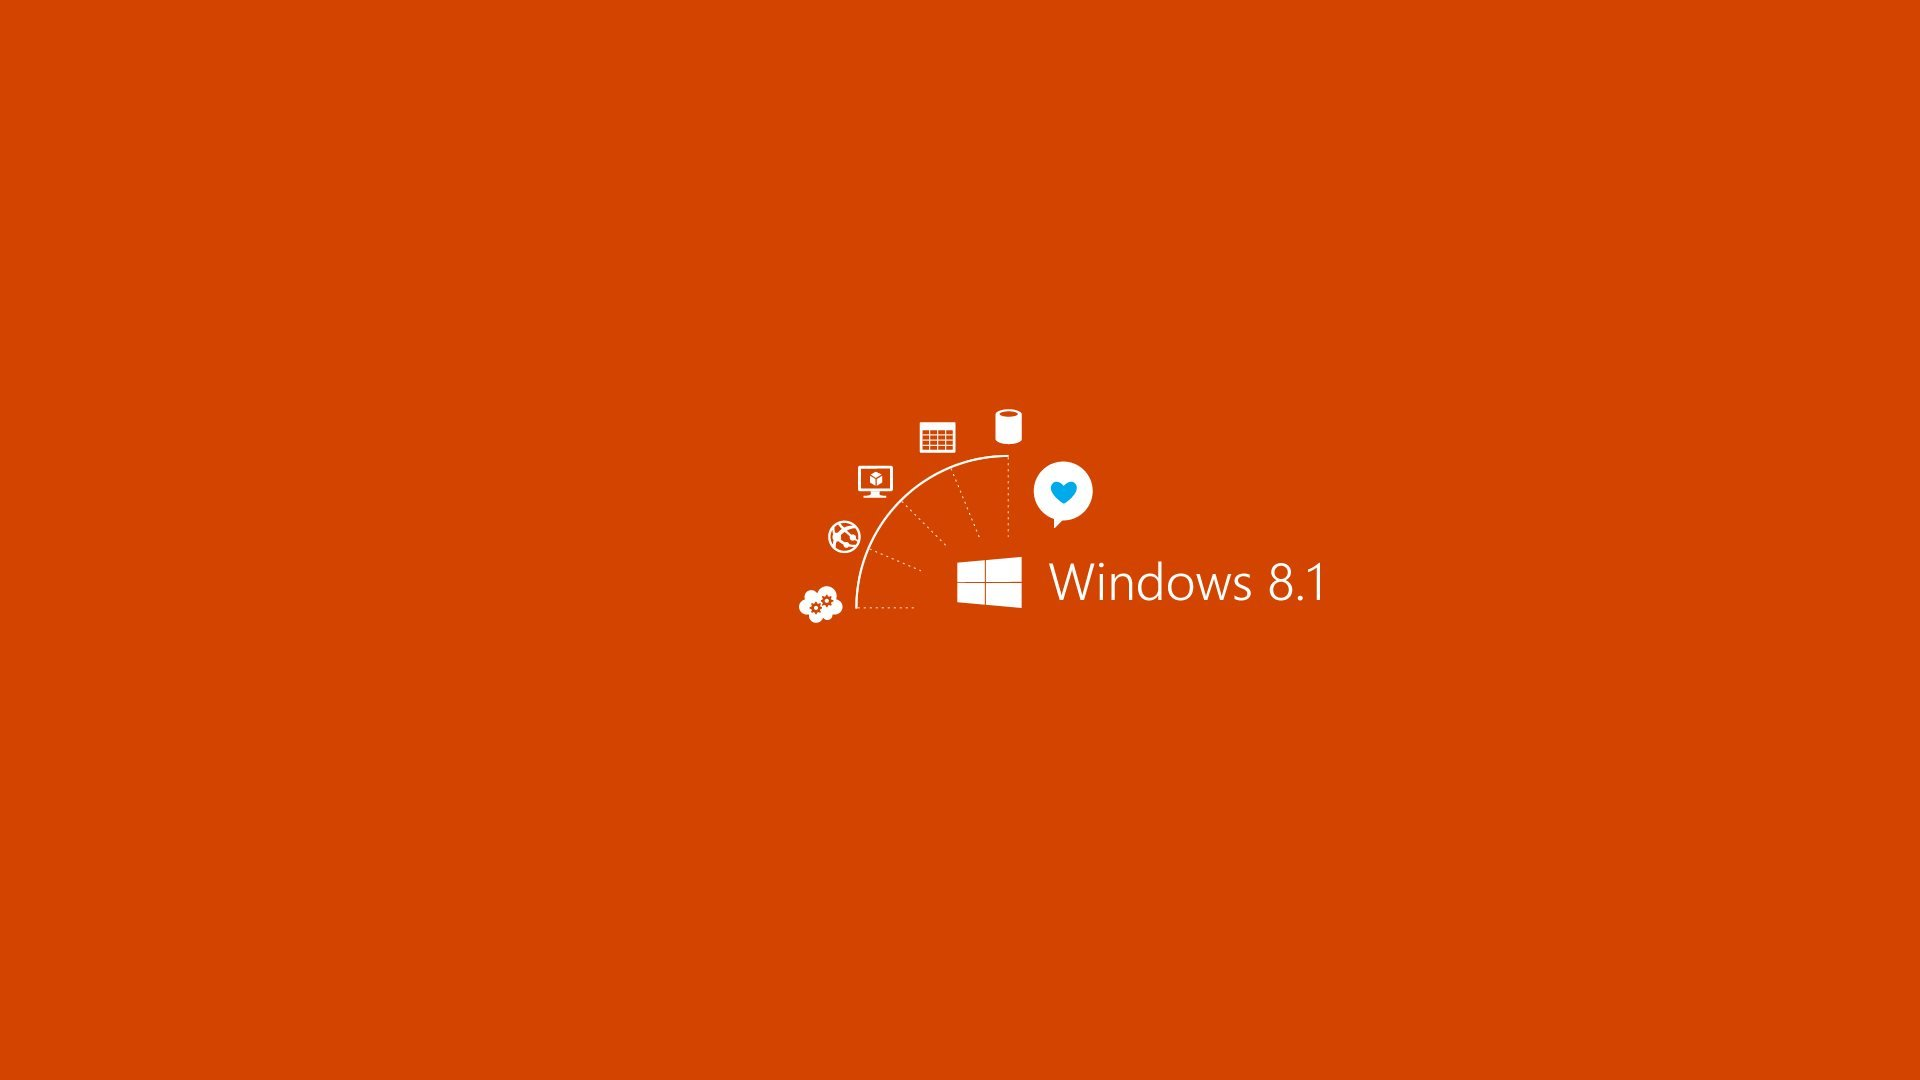 Free Download Windows 8 1 Wallpaper Id 256285 Full Hd For